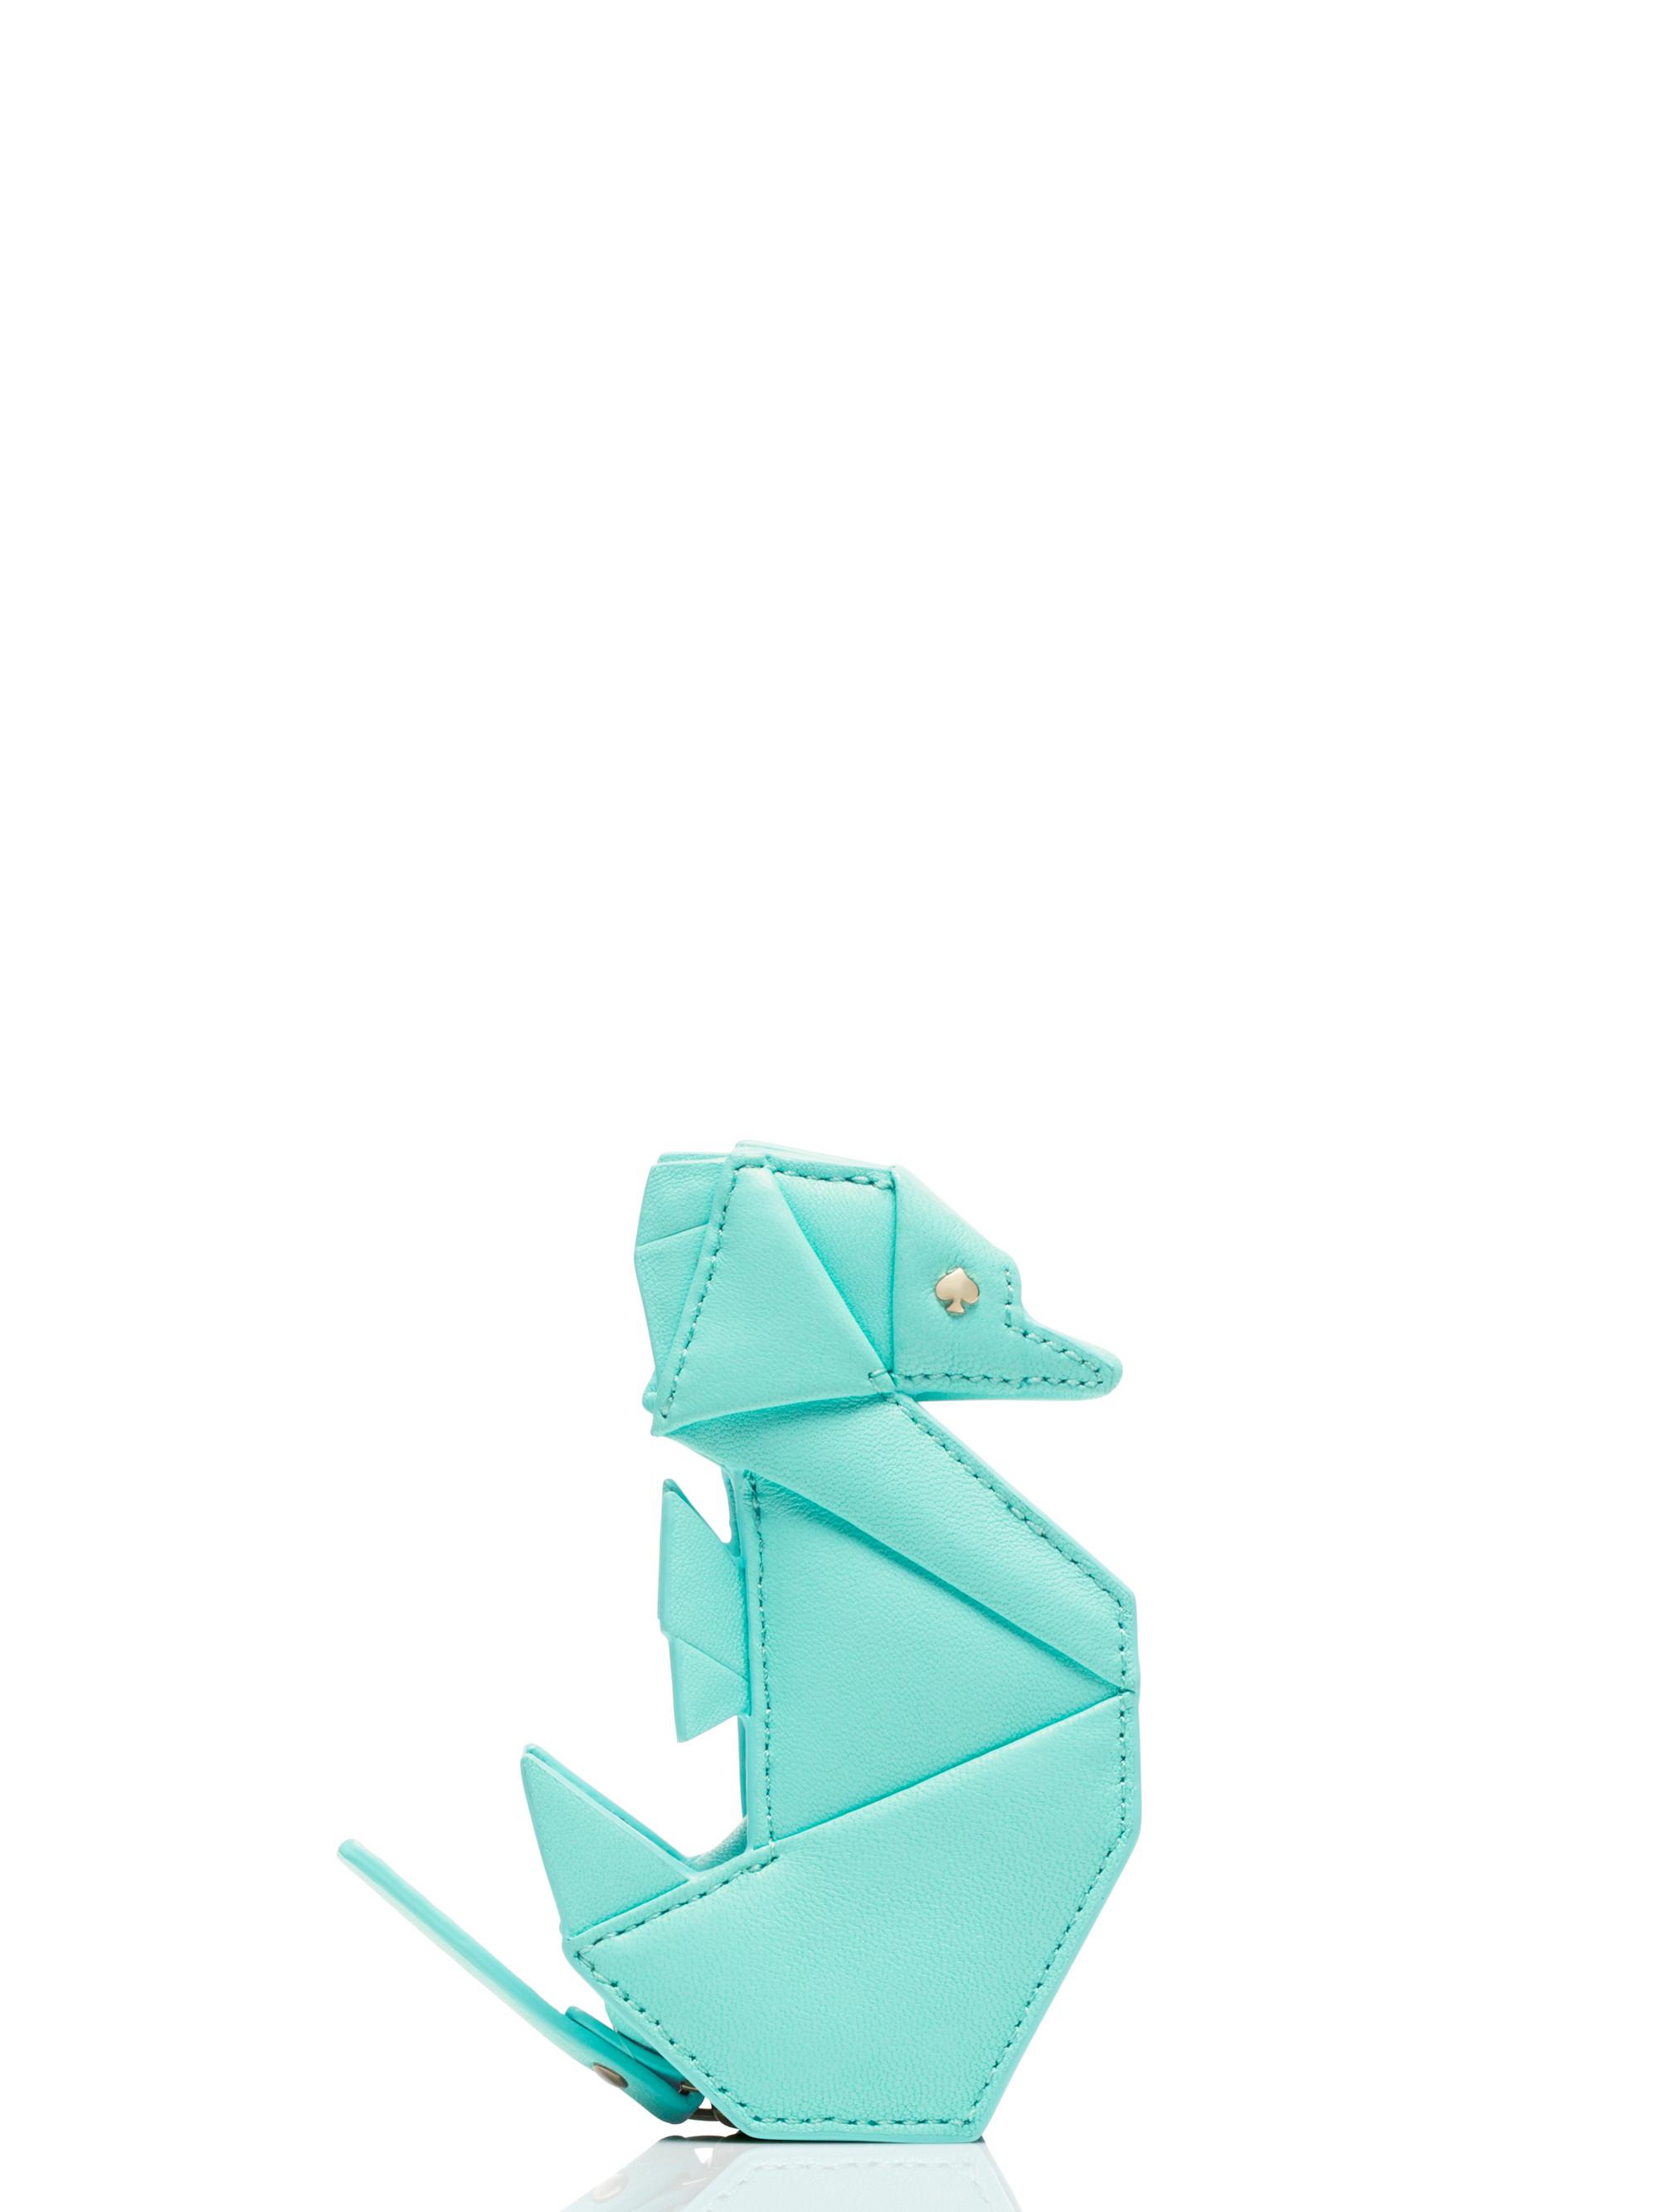 Lyst - Kate Spade New York Breath Of Fresh Air Origami ... - photo#44